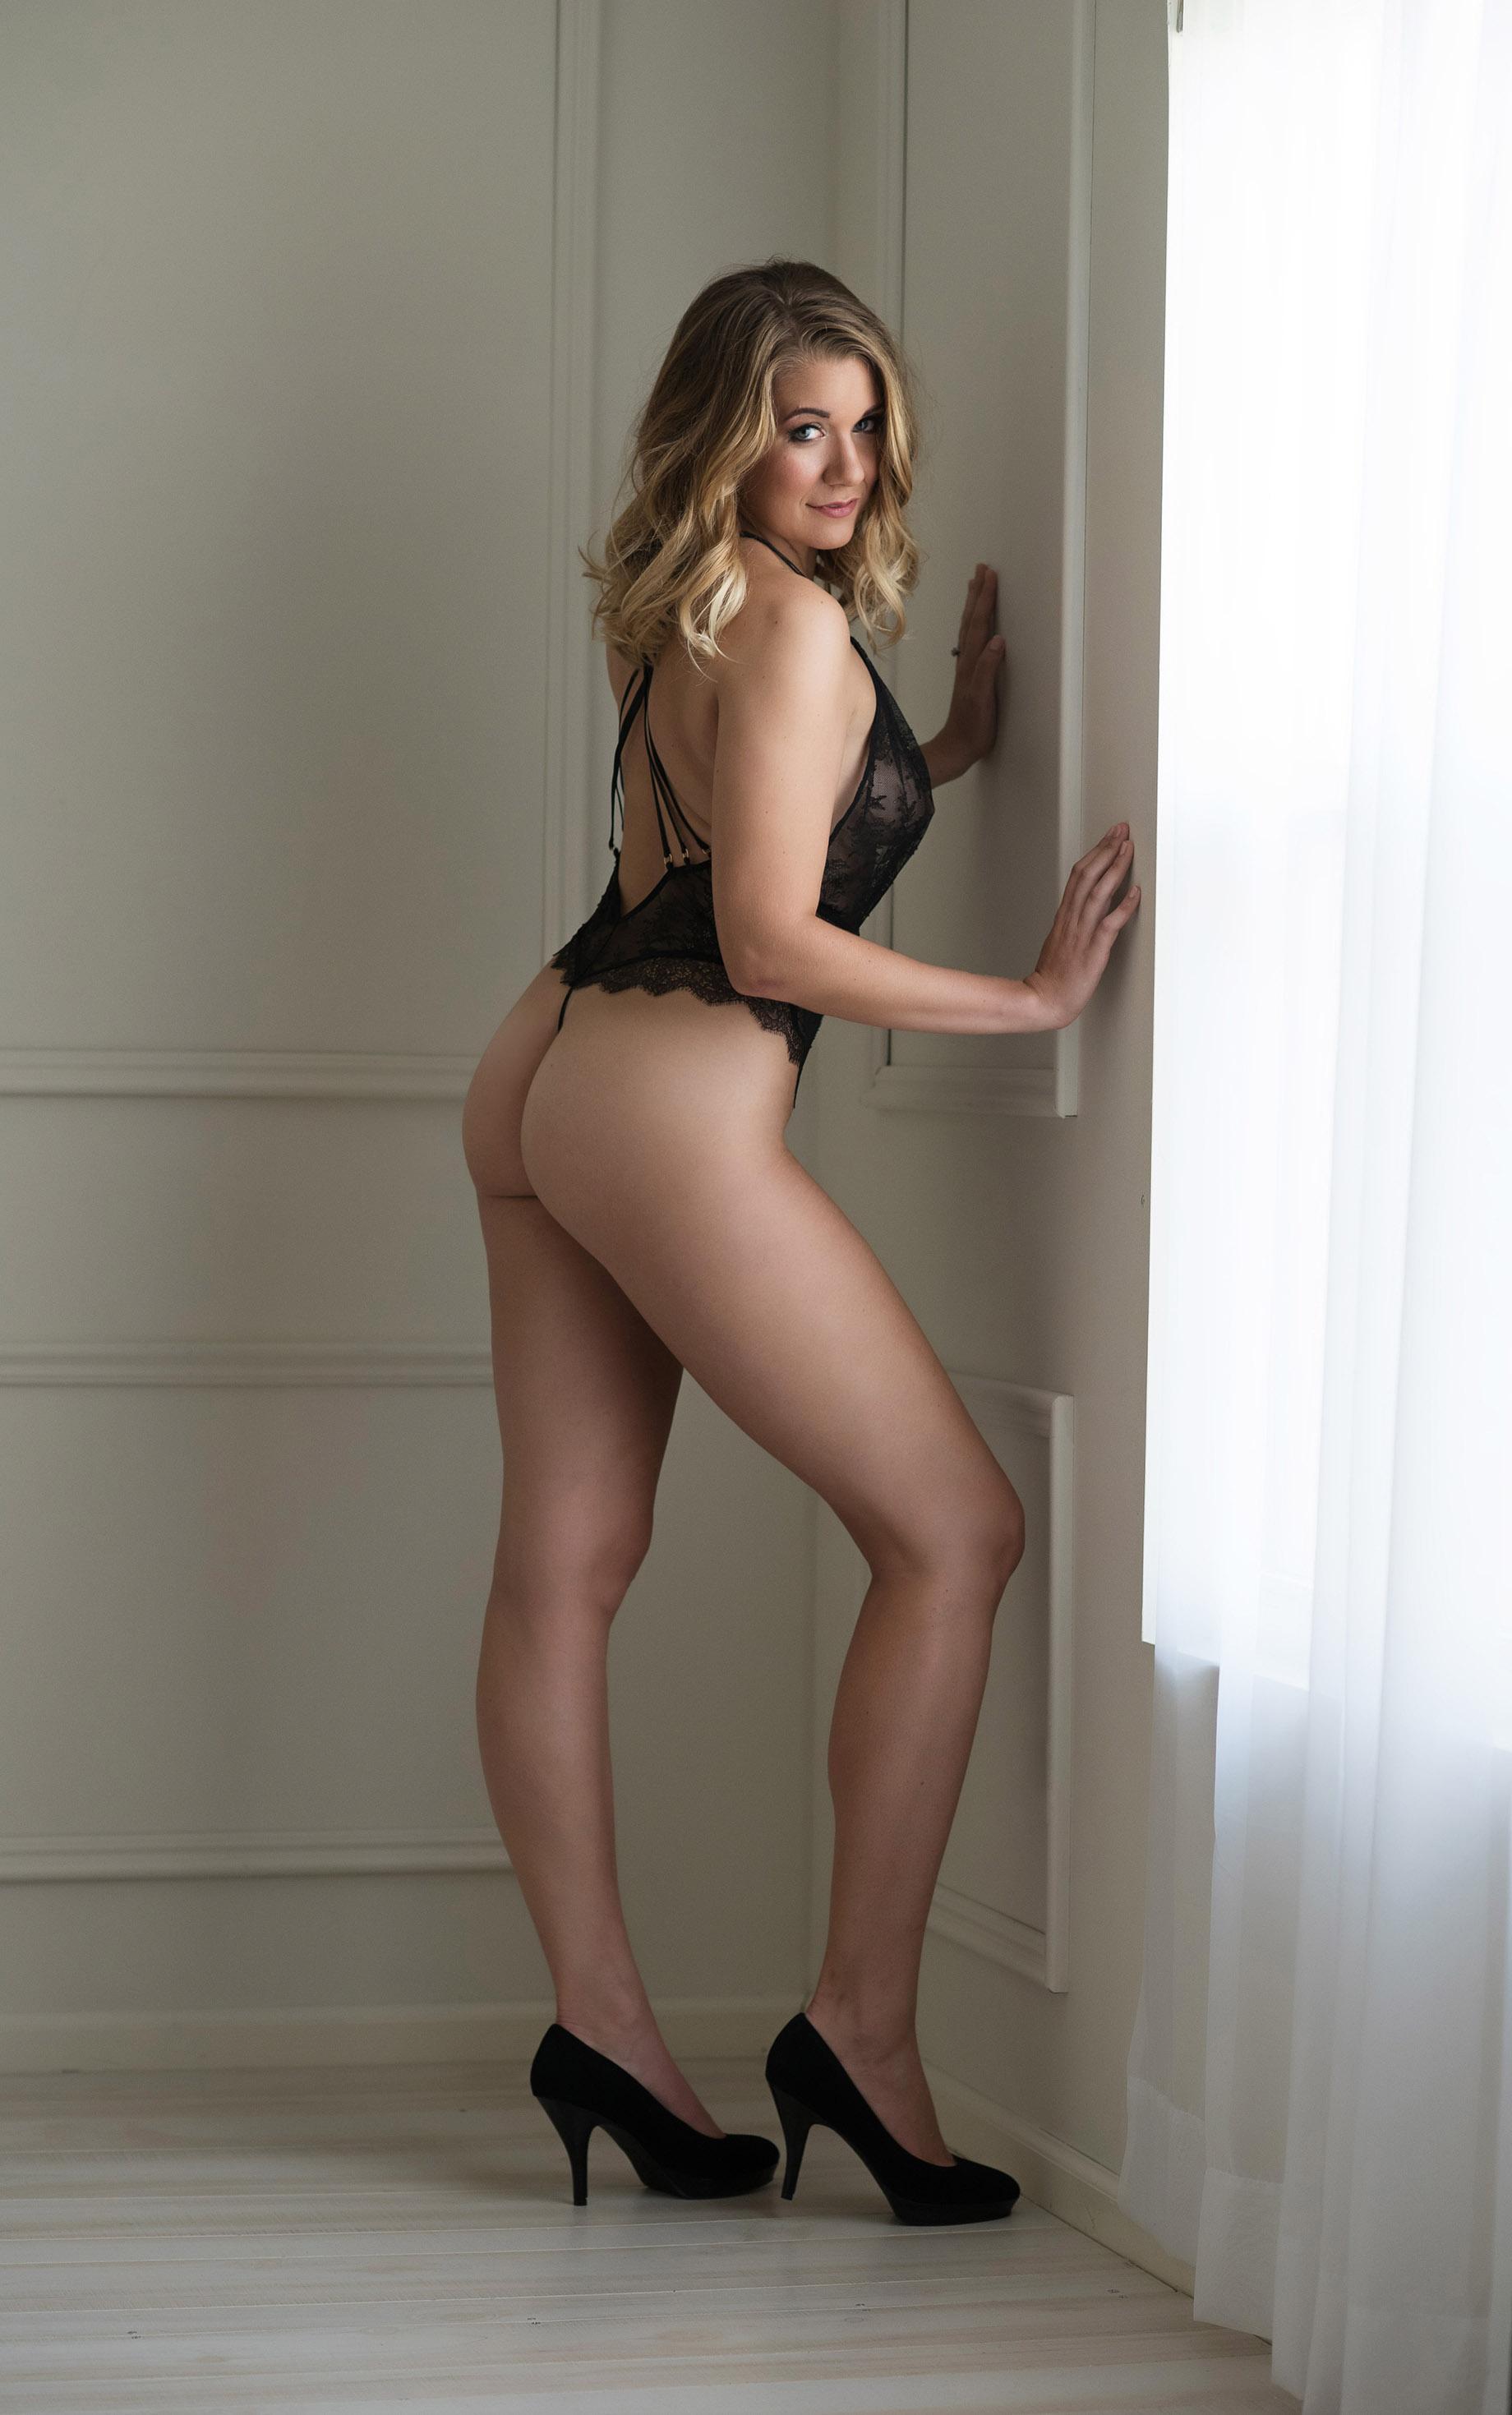 http://devinestudios.com/boudoir/wp-content/uploads/2016/02/12-781-page/kansas-boudoir-photos-sexy-black-lingerie-intimate-photography-1.jpg